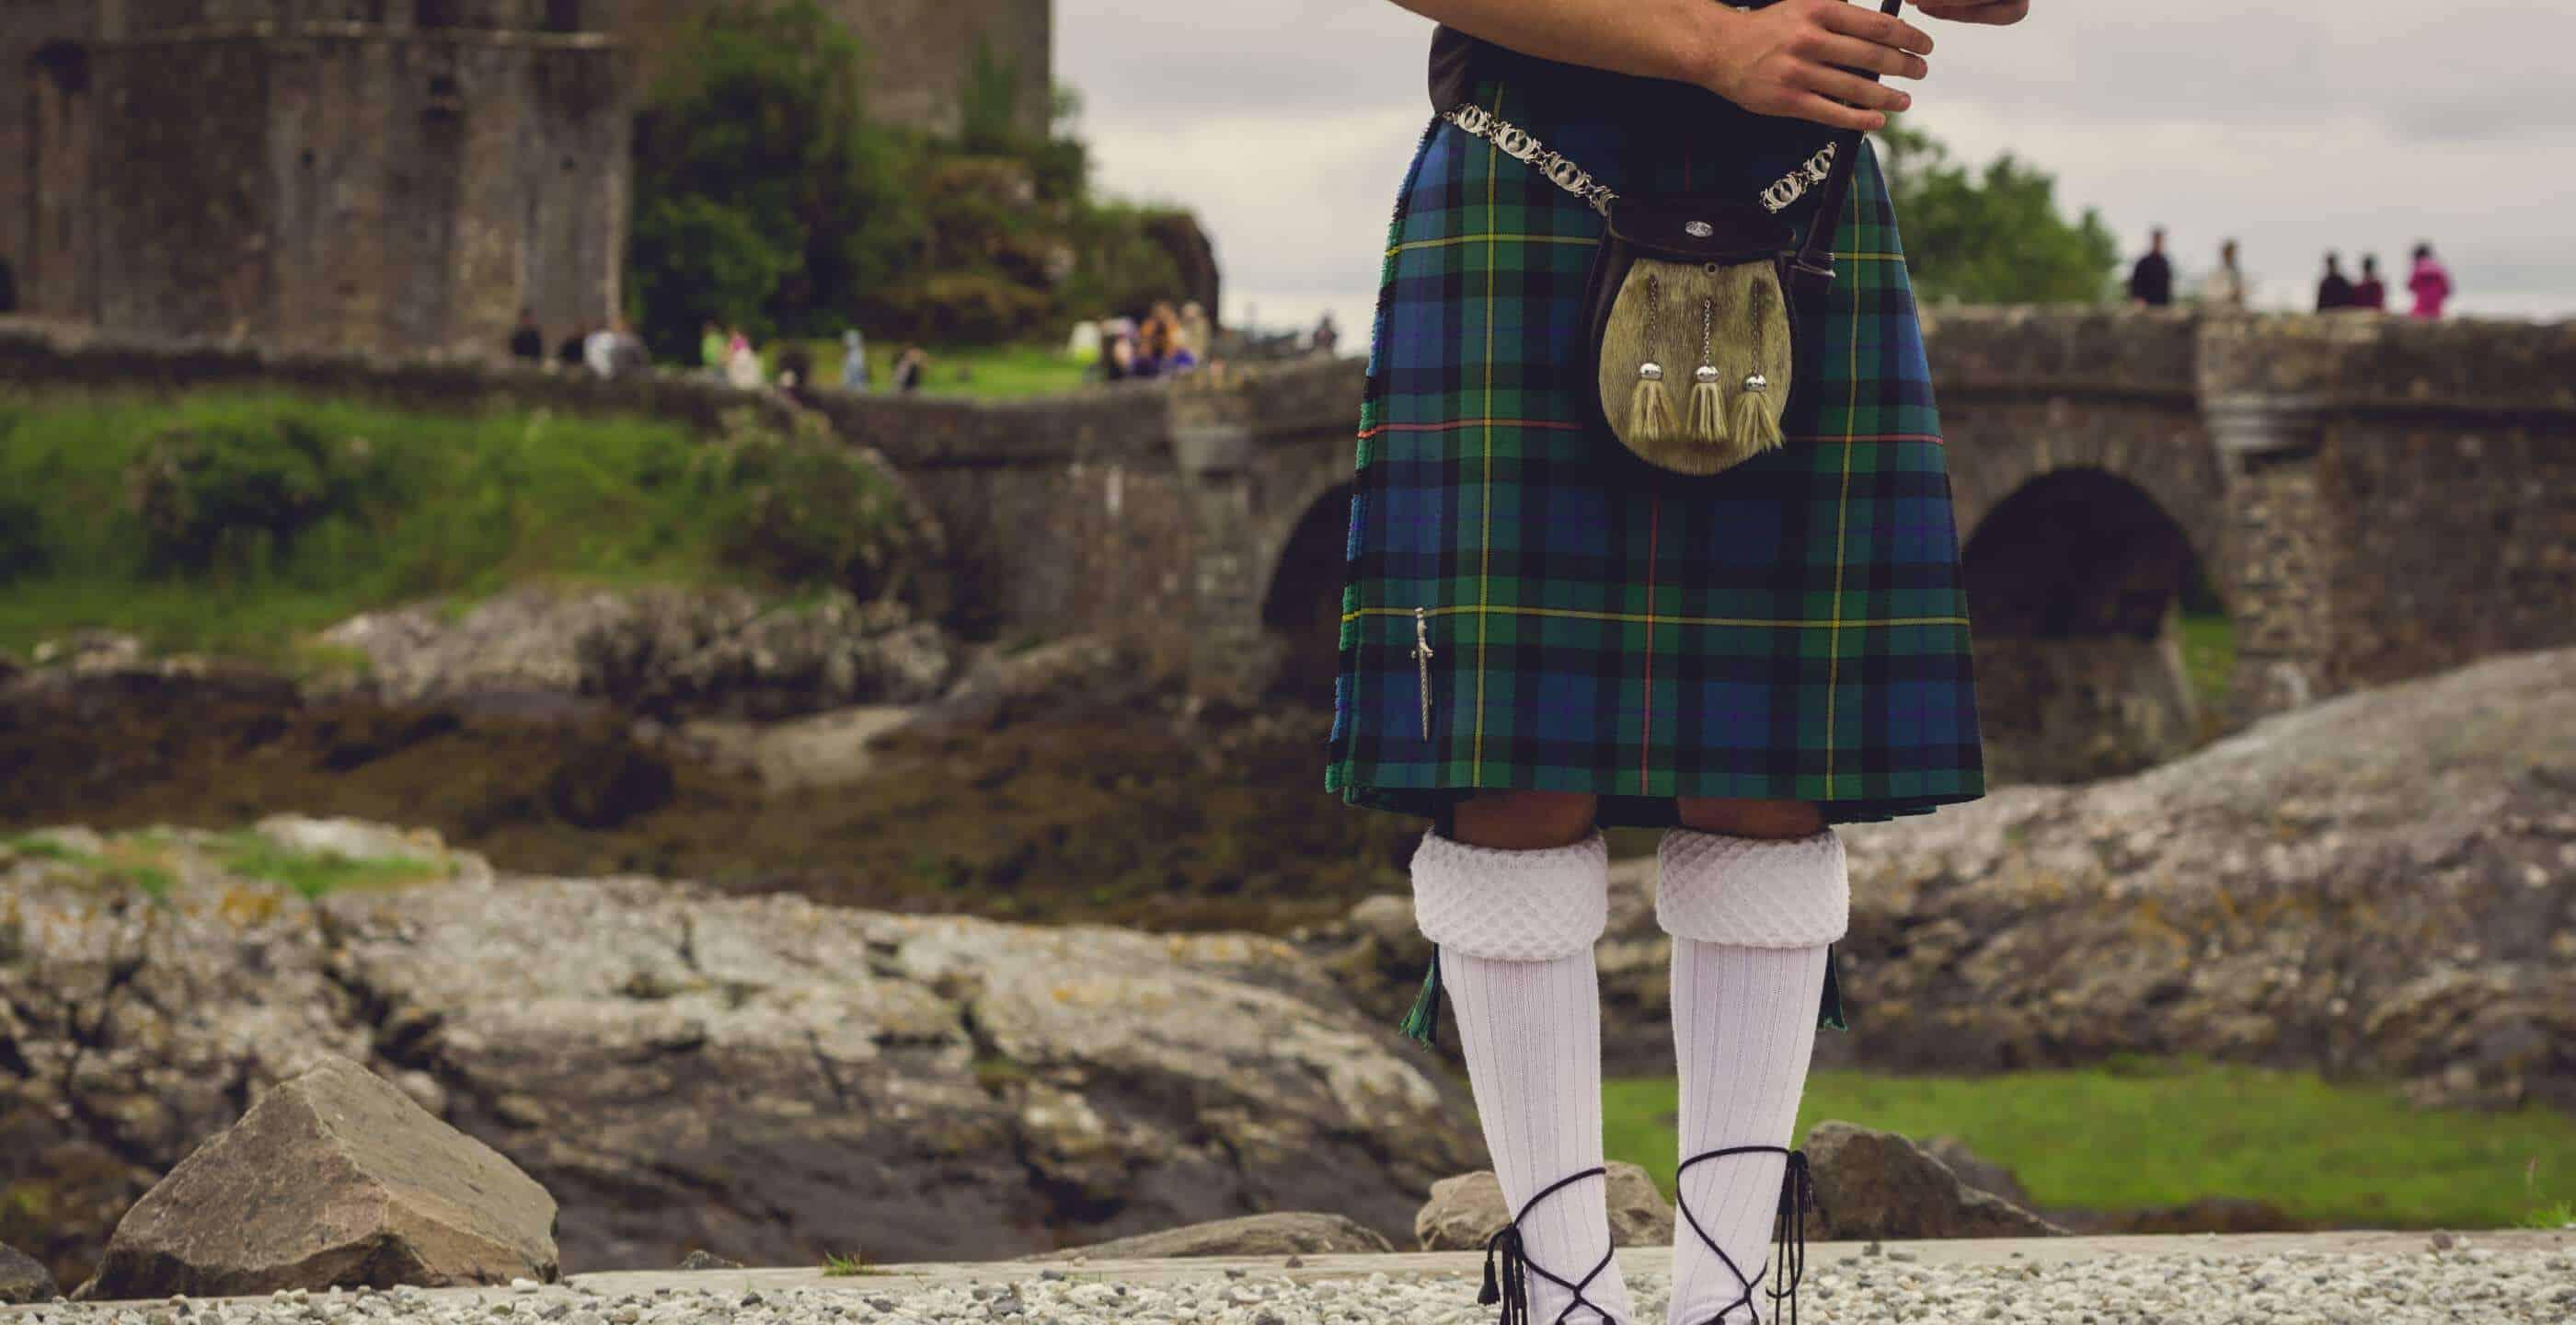 The Scottish Sporran